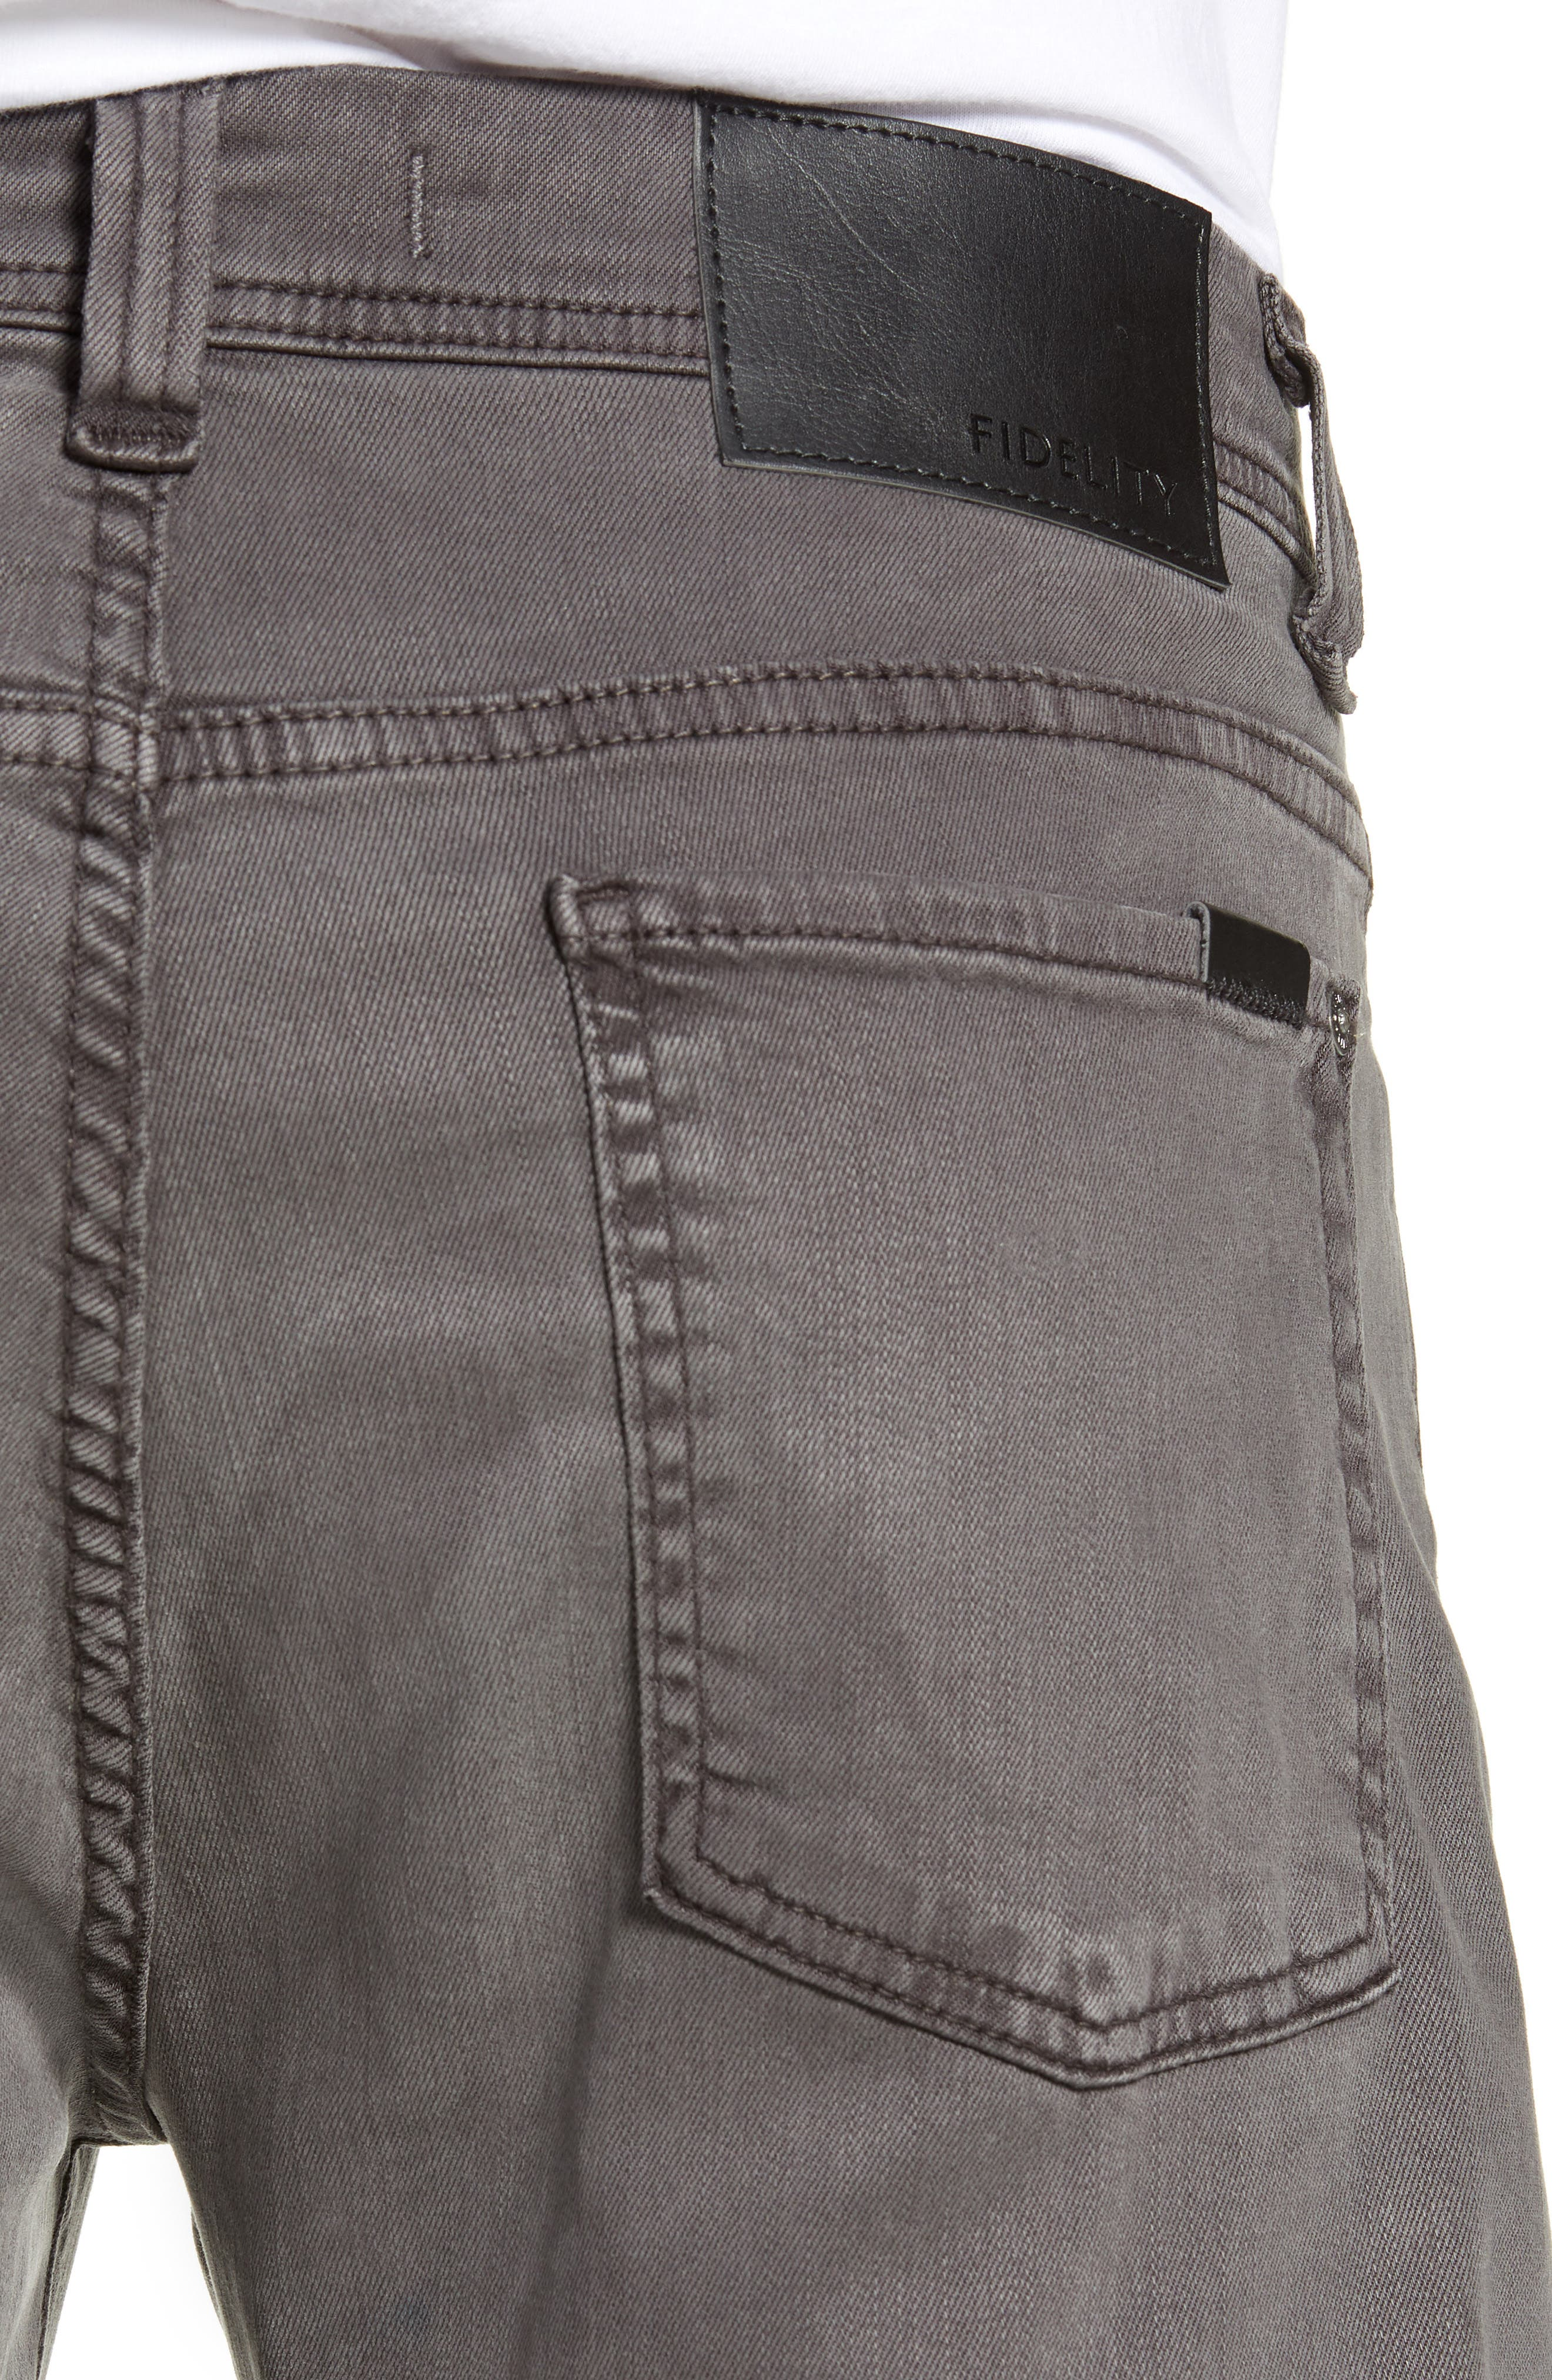 Jimmy Slim Straight Leg Jeans,                             Alternate thumbnail 4, color,                             LEAD